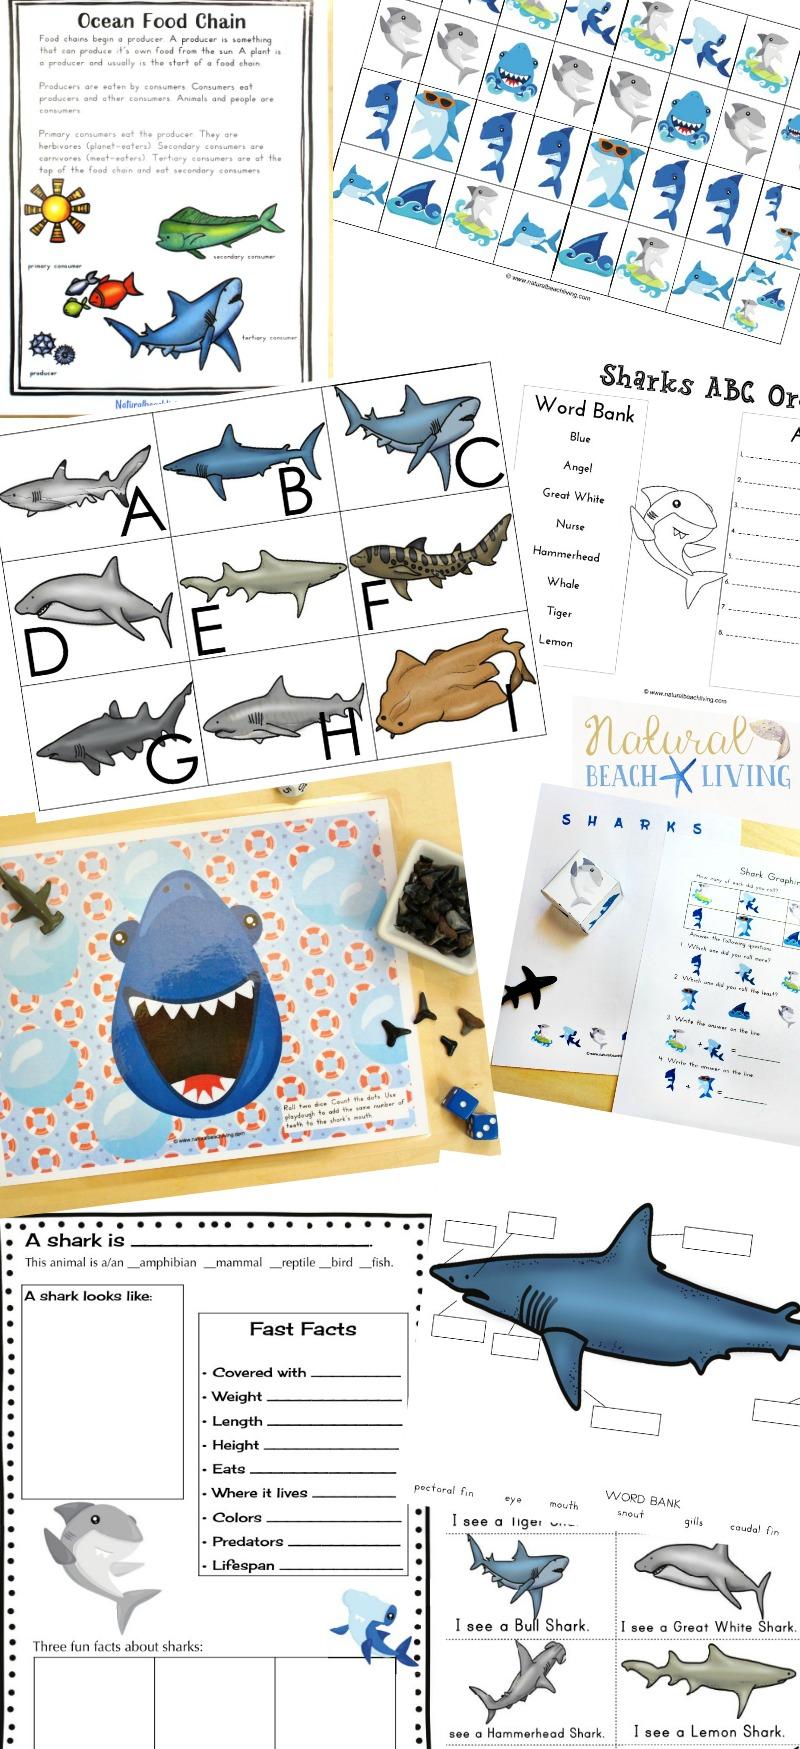 The Best Shark Printable Activities for Kids, Shark Week Ideas, Shark Week for Kids, Shark Theme, Parts of a shark